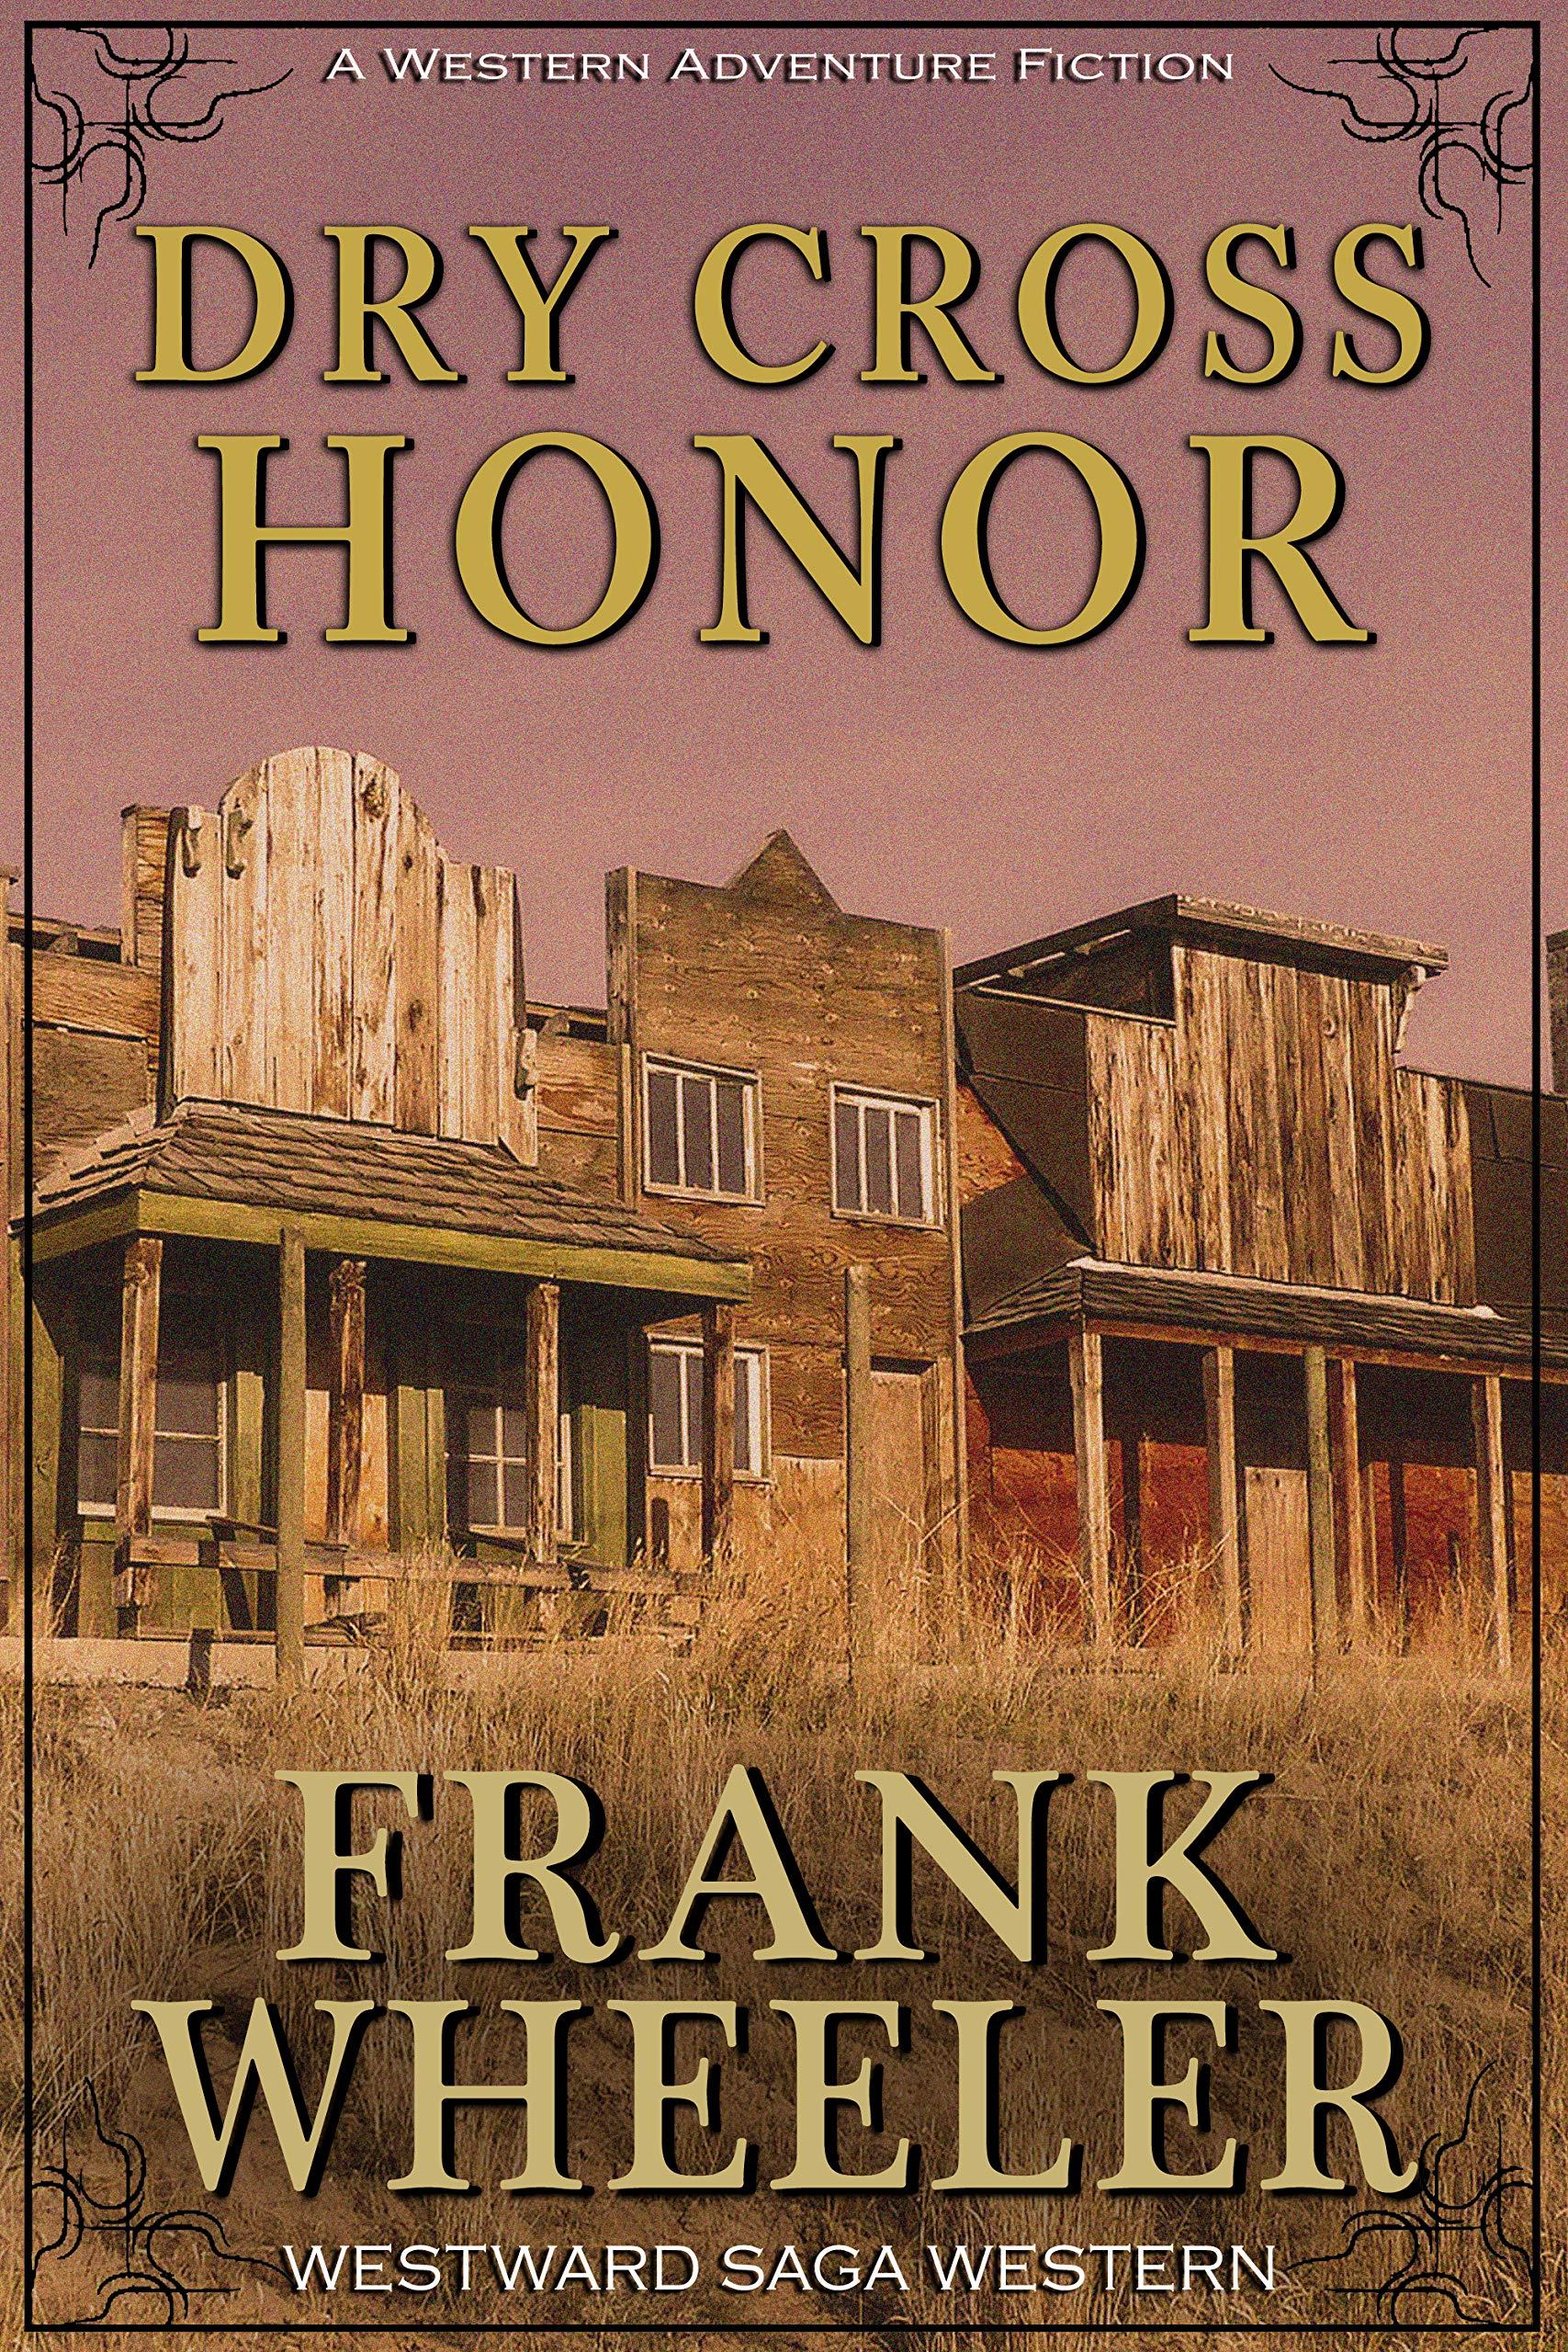 Dry Cross Honor (Westward Saga Western) (A Western Adventure Fiction)